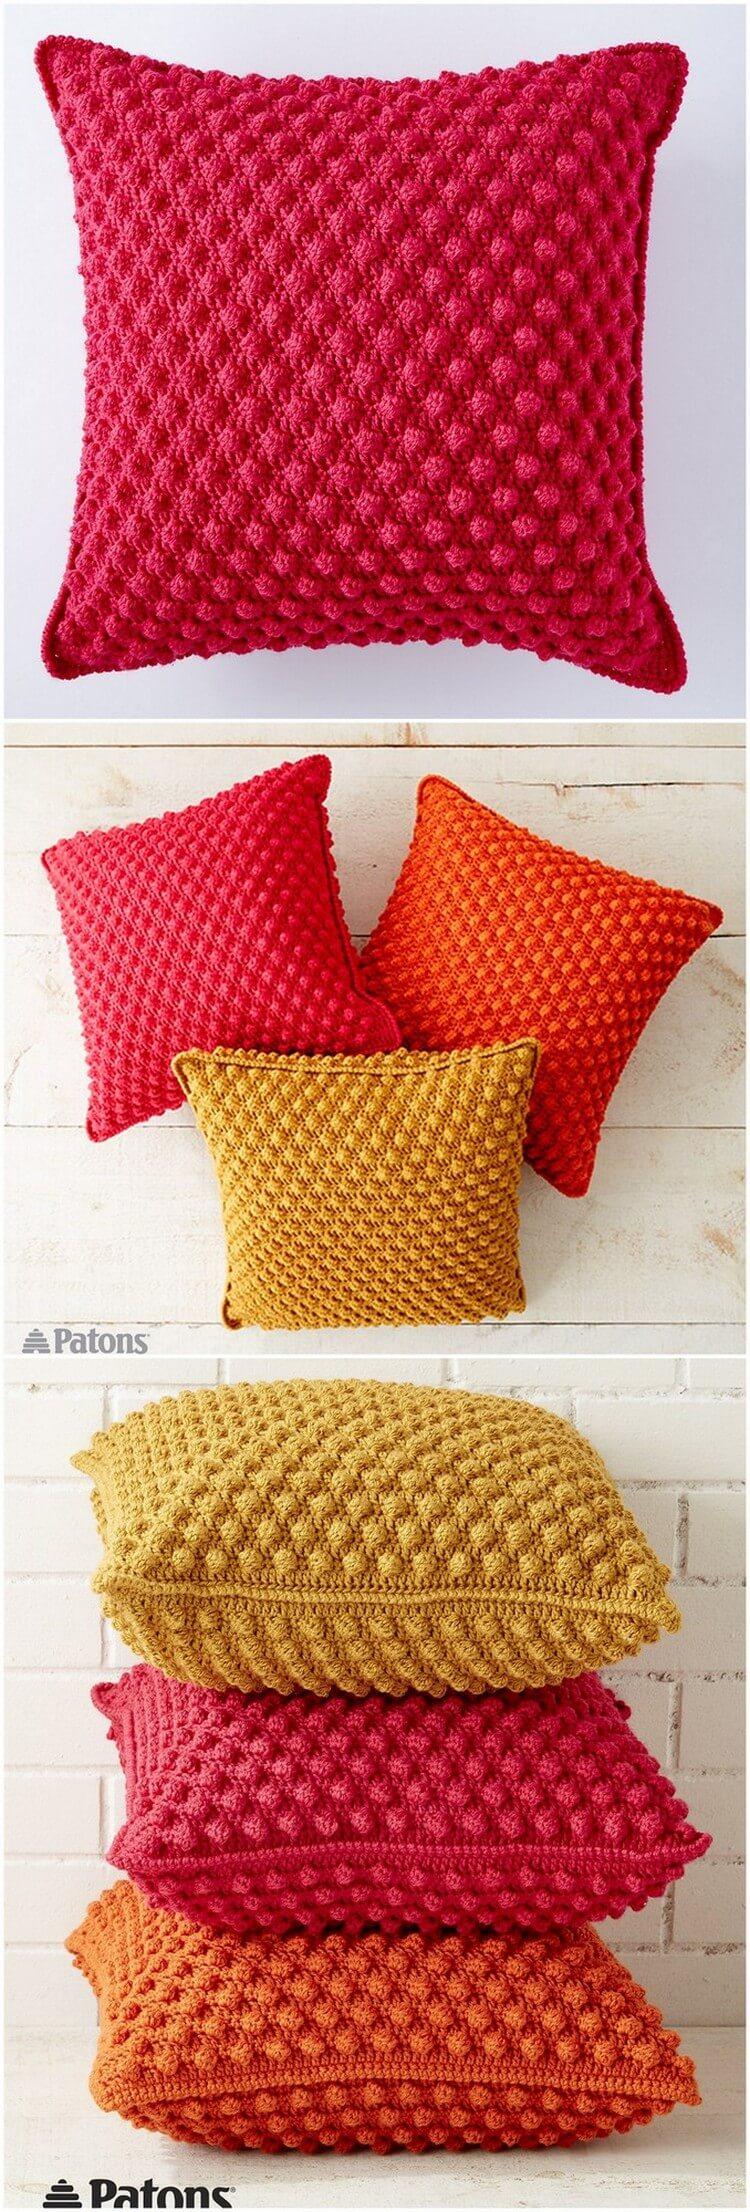 Crochet Pillow Free Pattern (34)